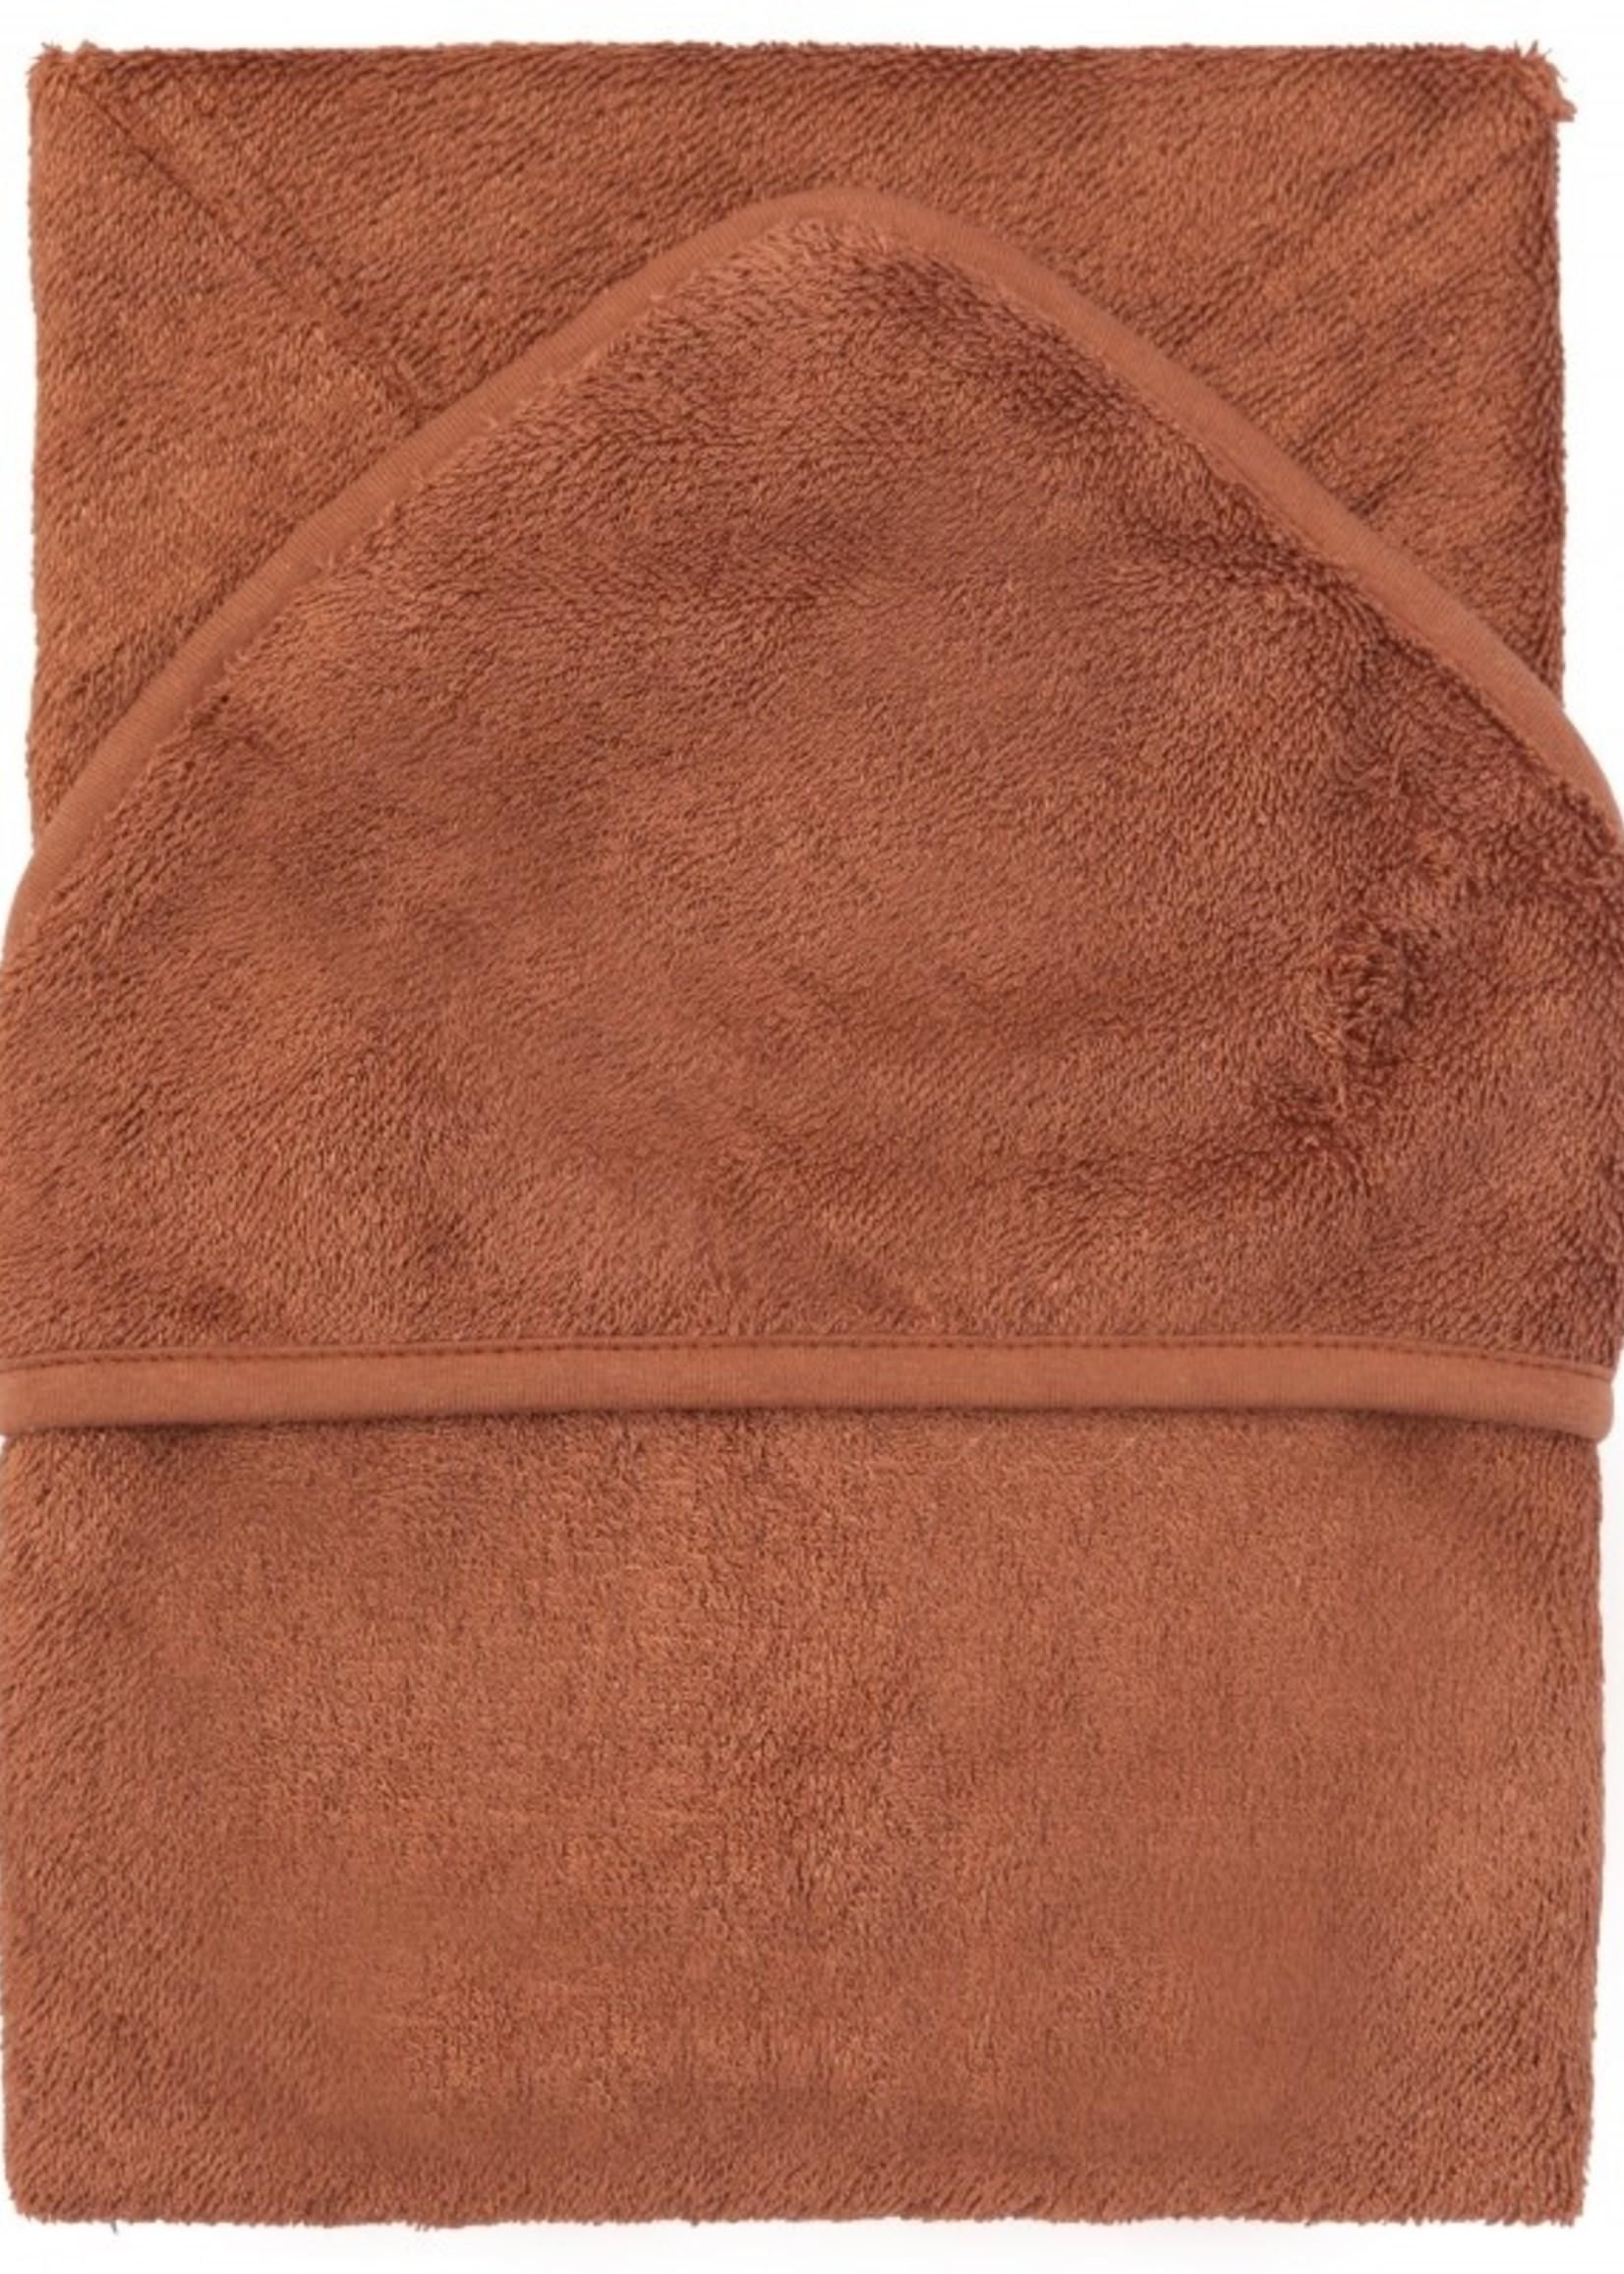 Timboo Hooded towel XL - Hazel Brown